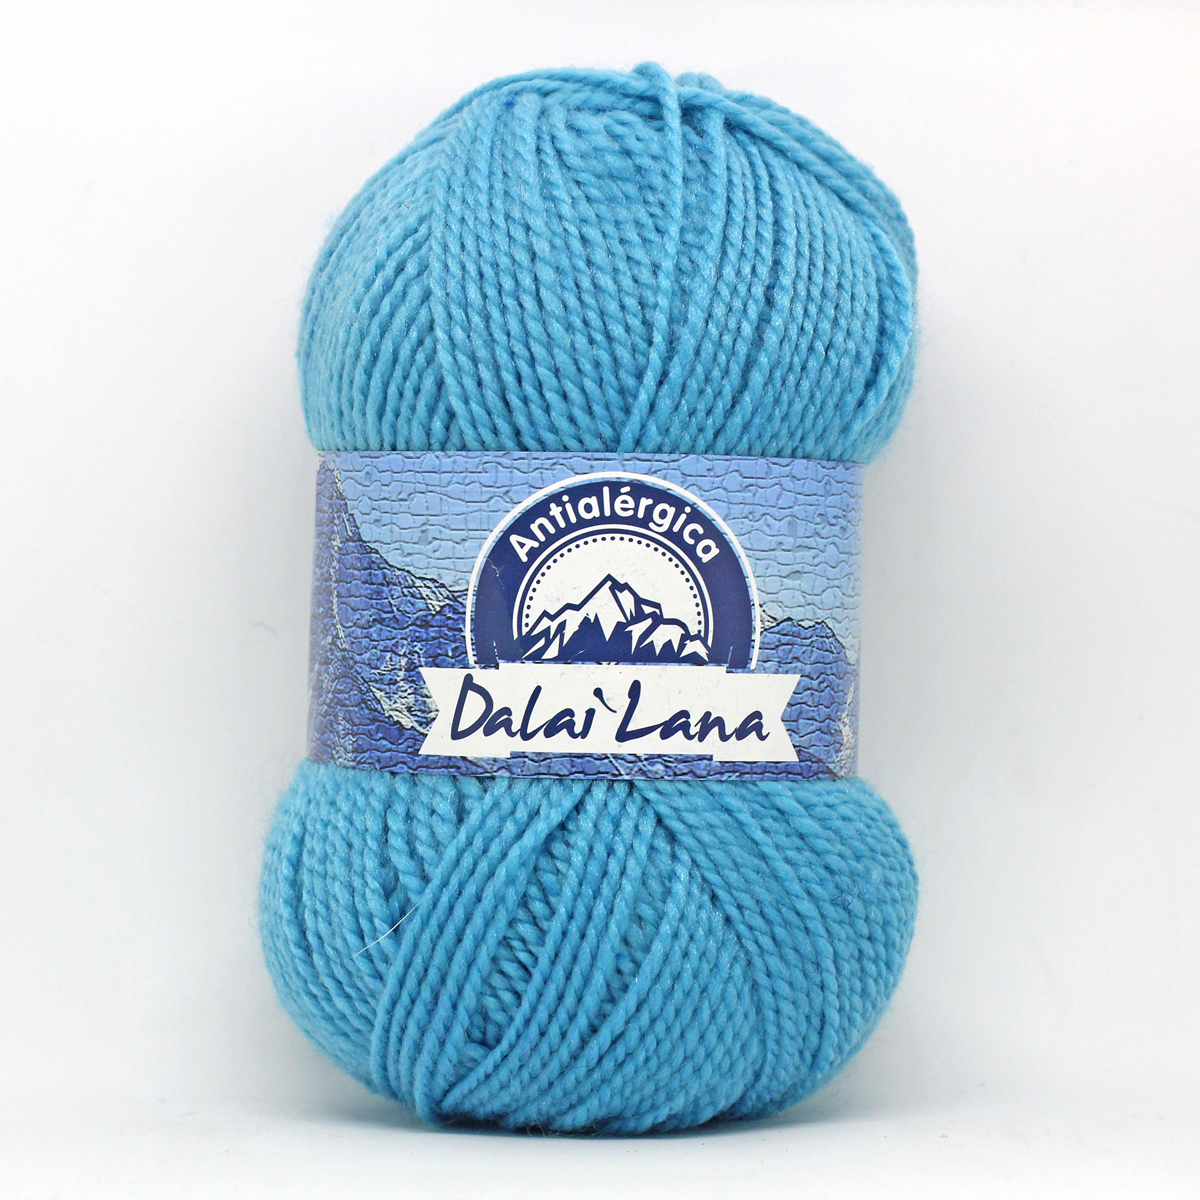 Dalai Lana - 765